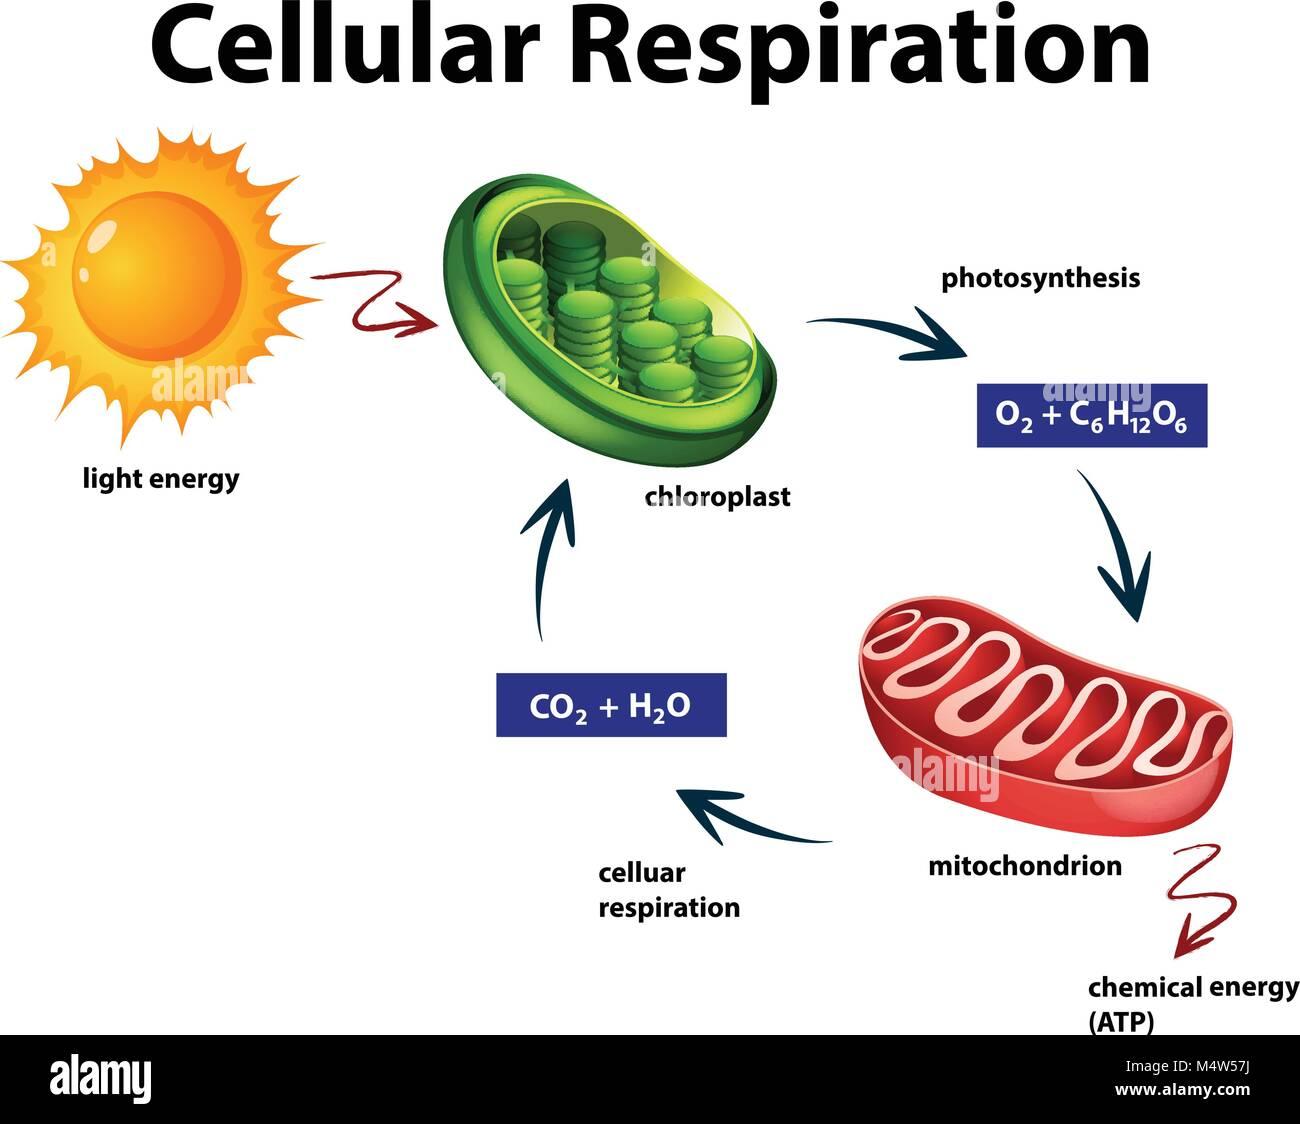 diagram showing cellular respiration illustration stock vector art